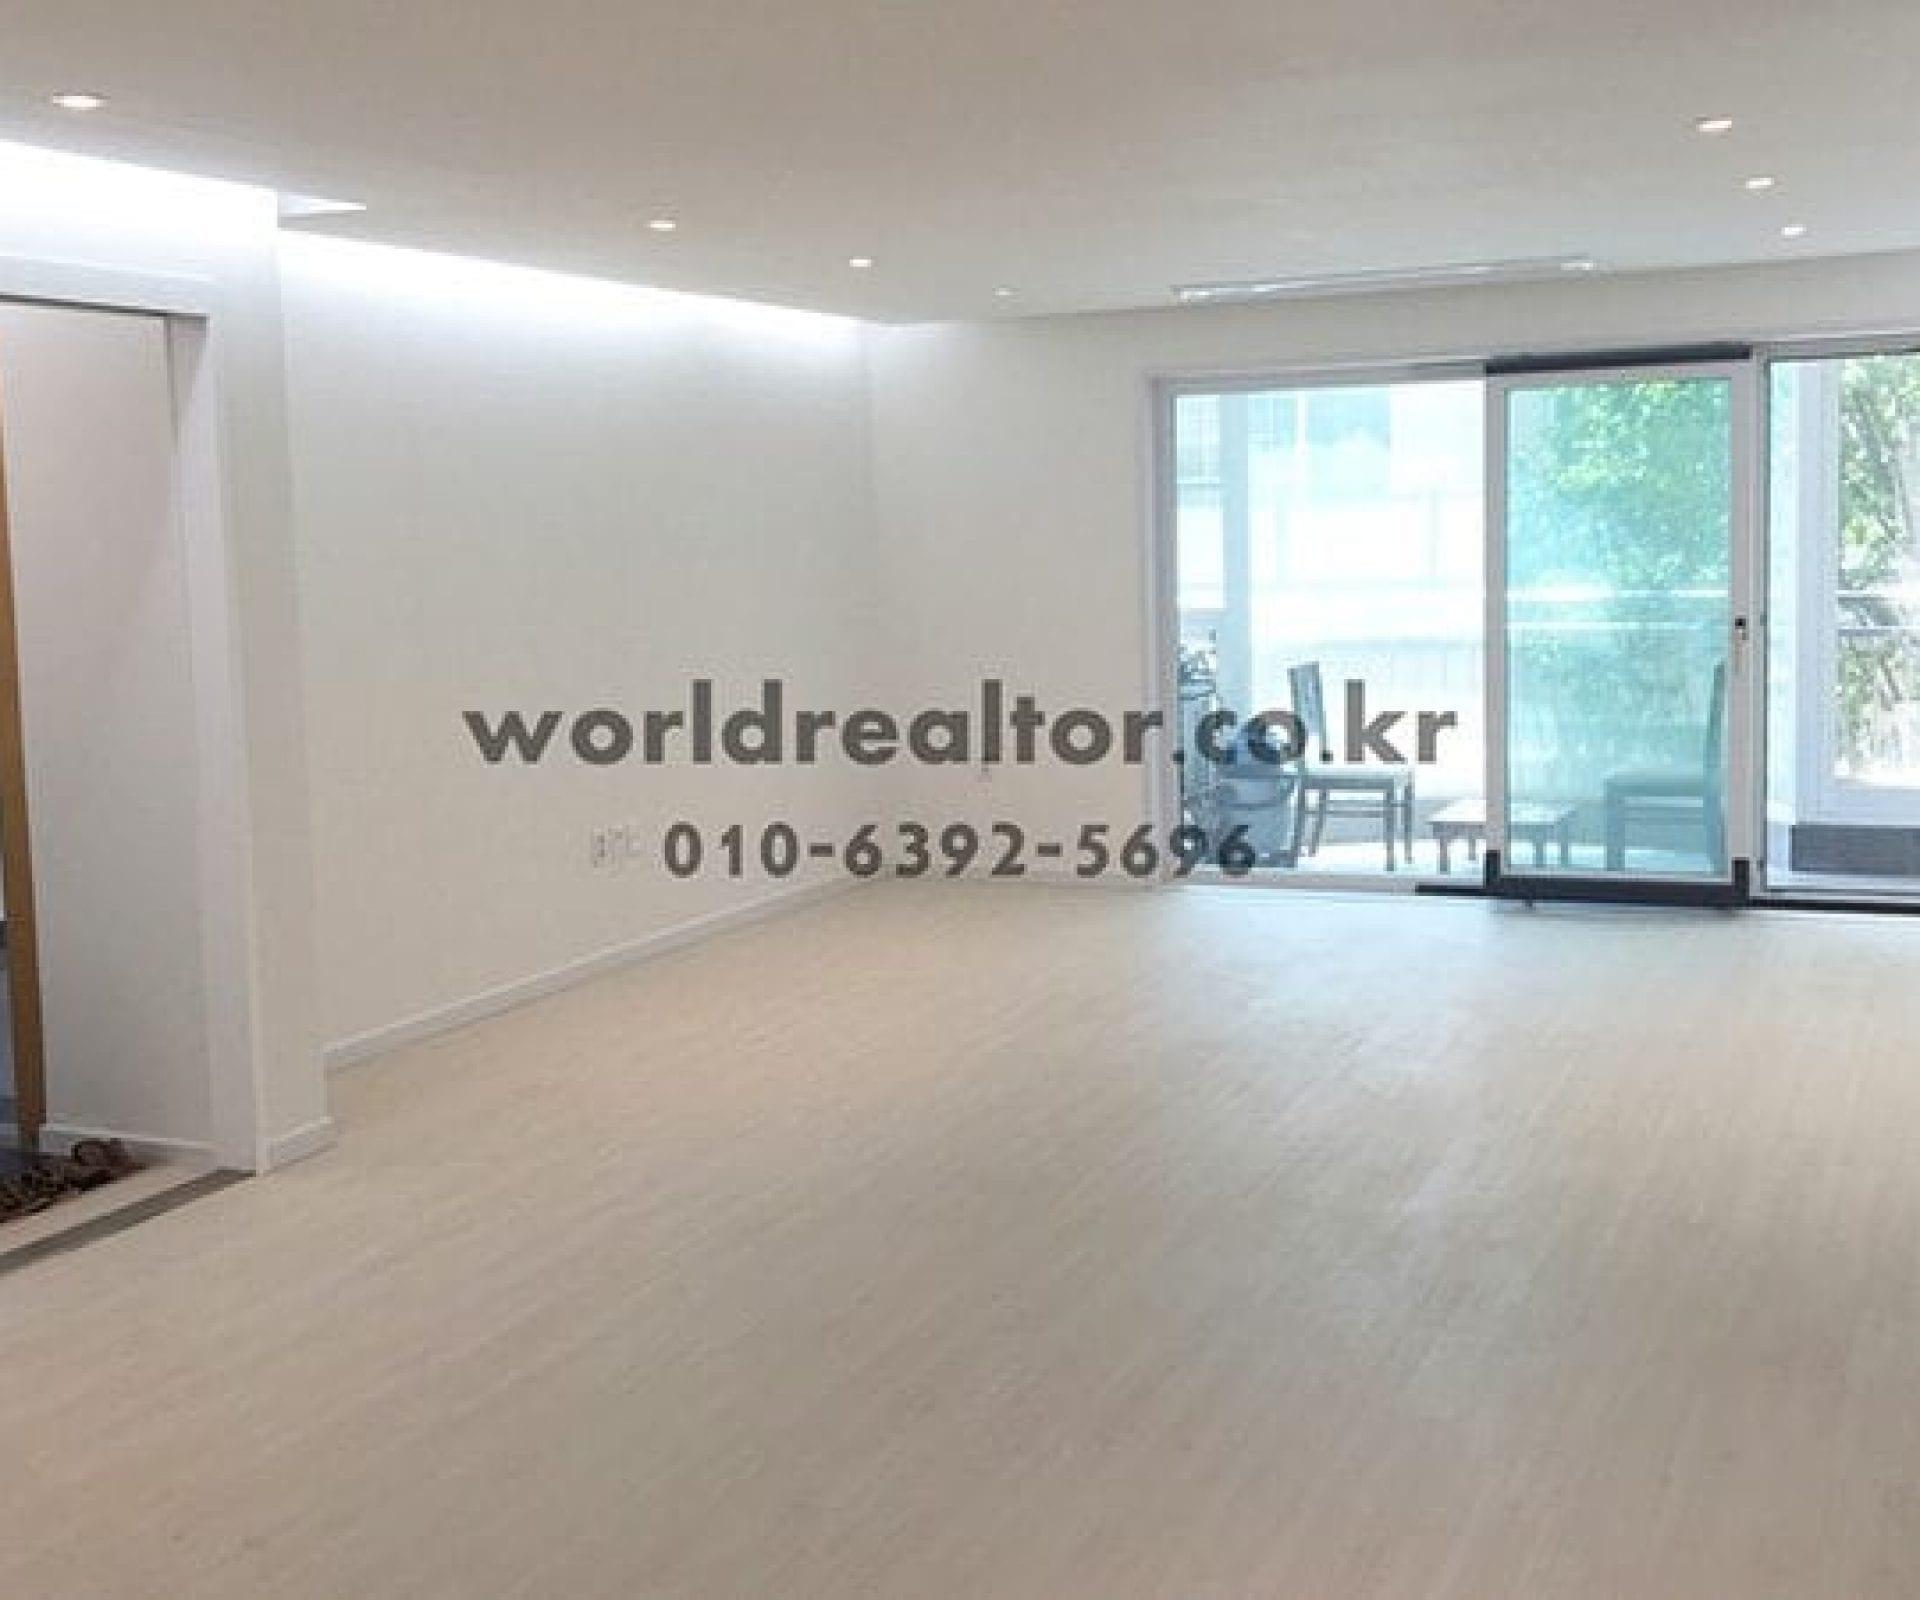 World Real Estate Co. | Seoul, Korea